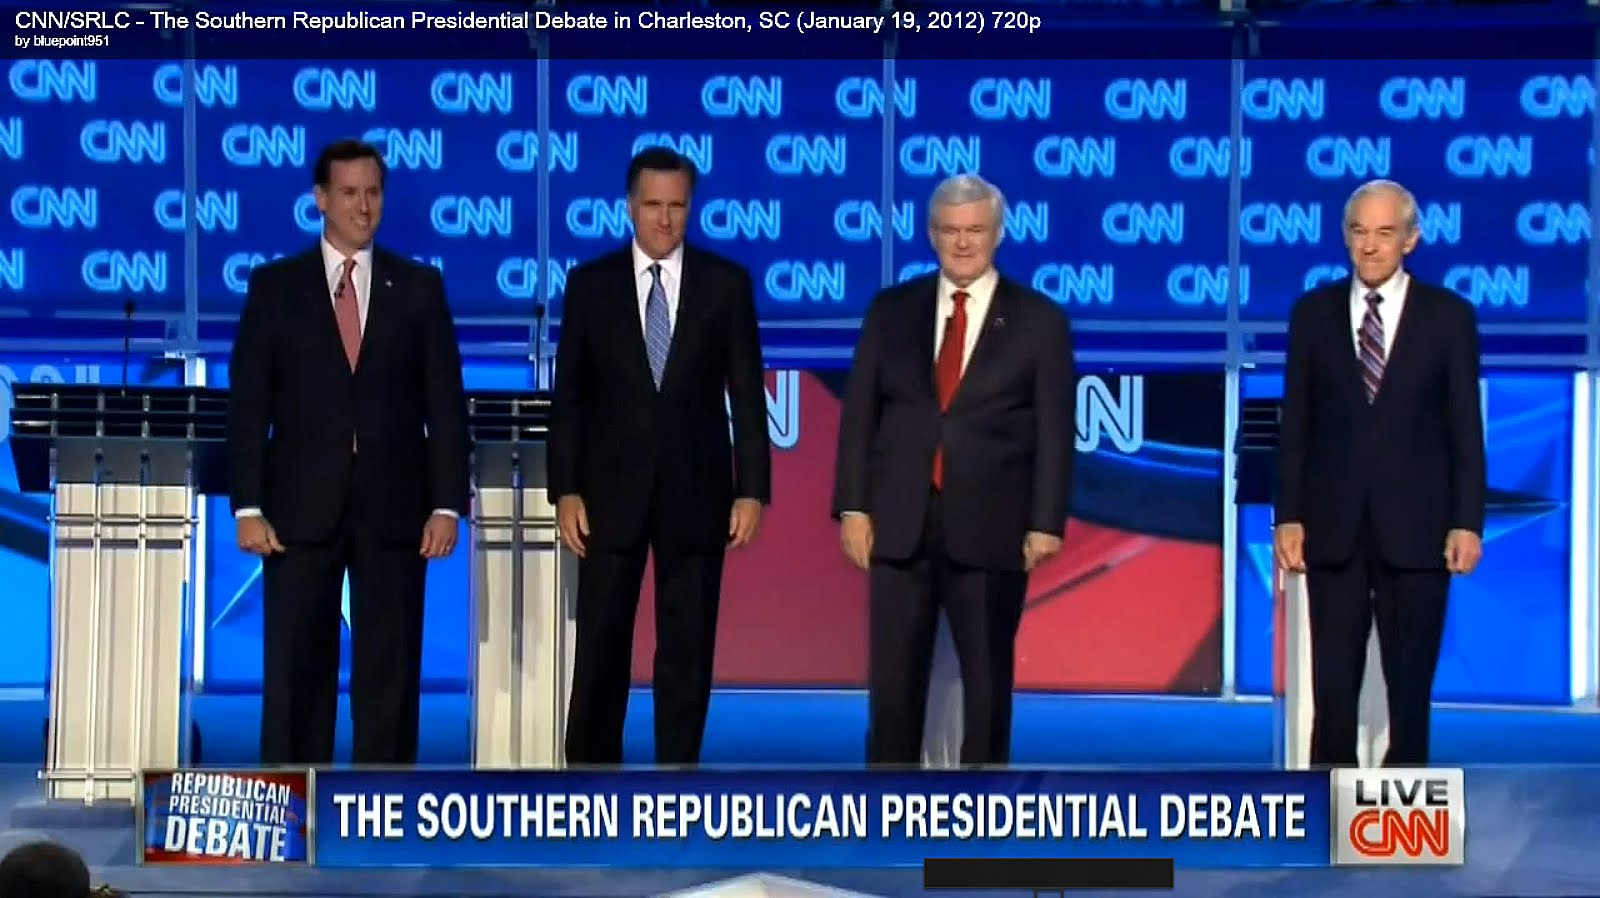 Republican Debate Nbc News Tampa Florida 01 23 12 Live Streaming Video